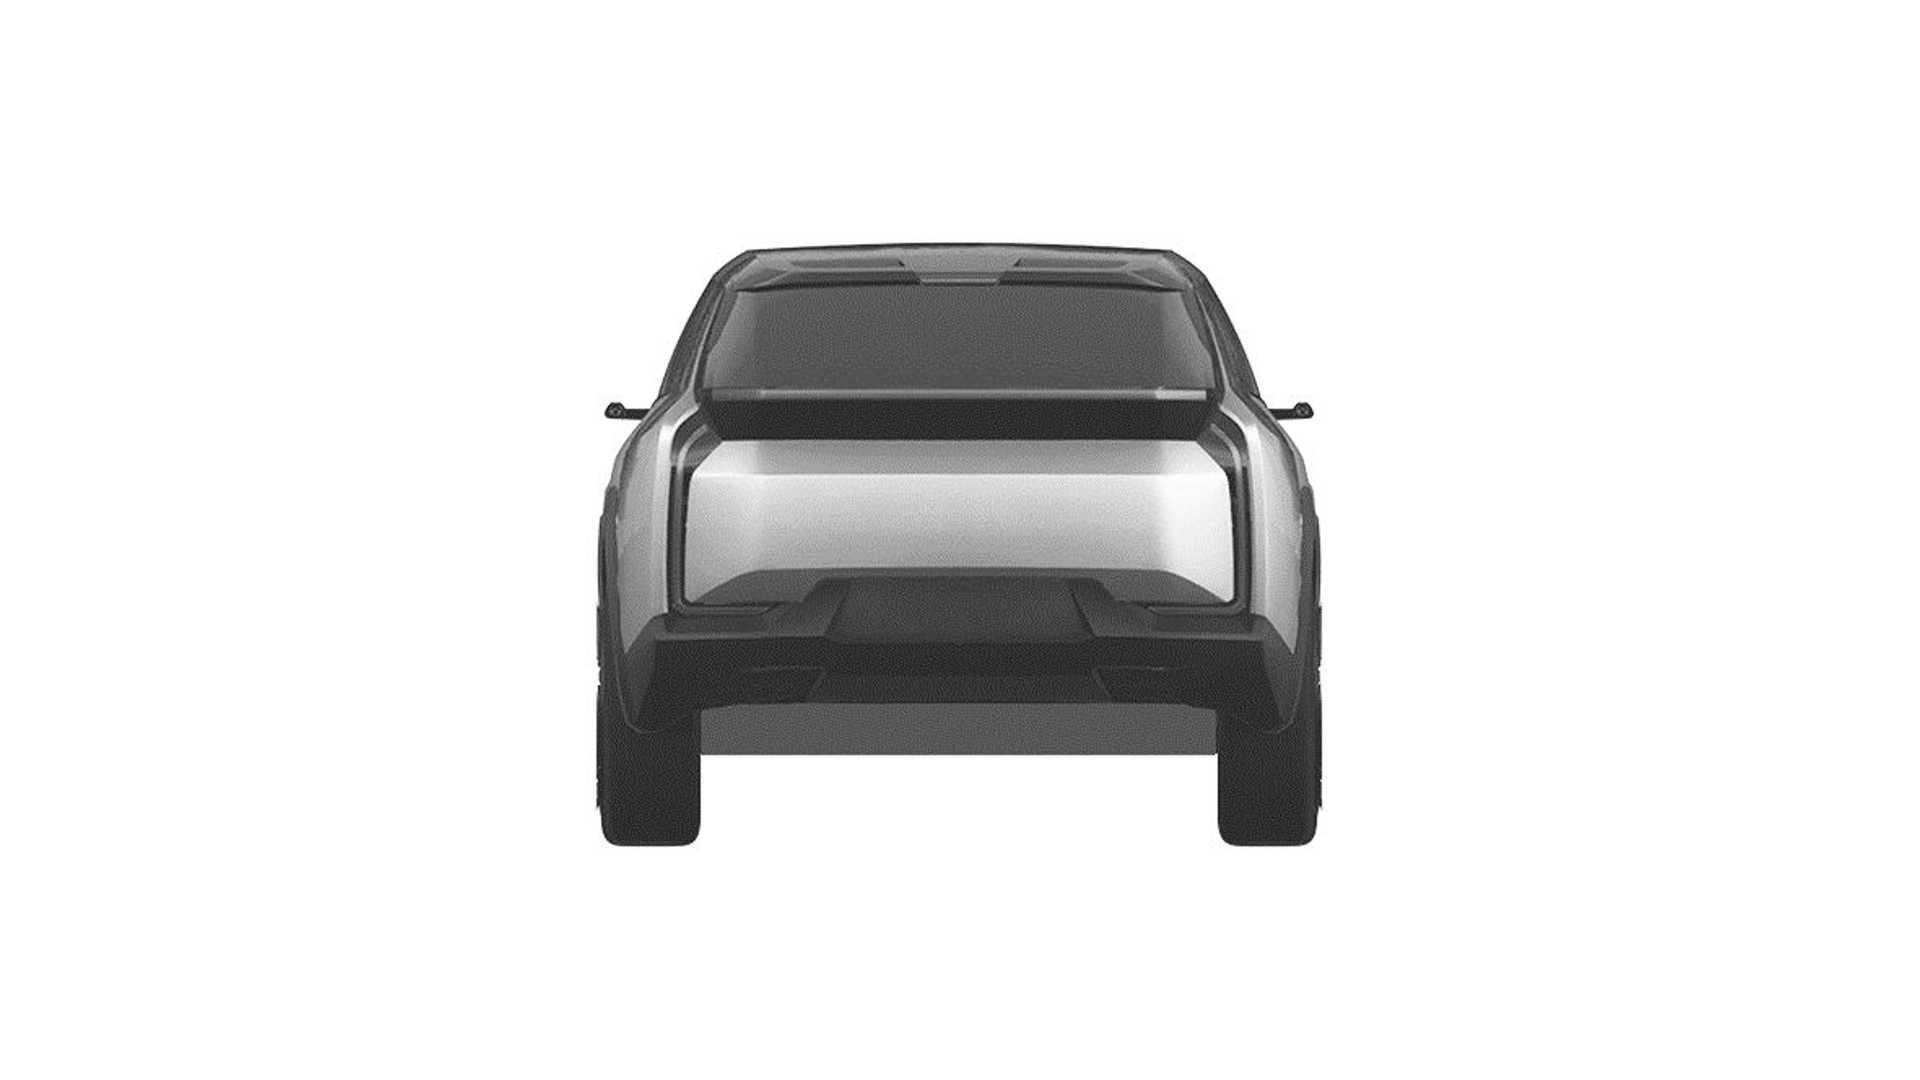 Toyota-Crossover-Design-Trademark-patents-6